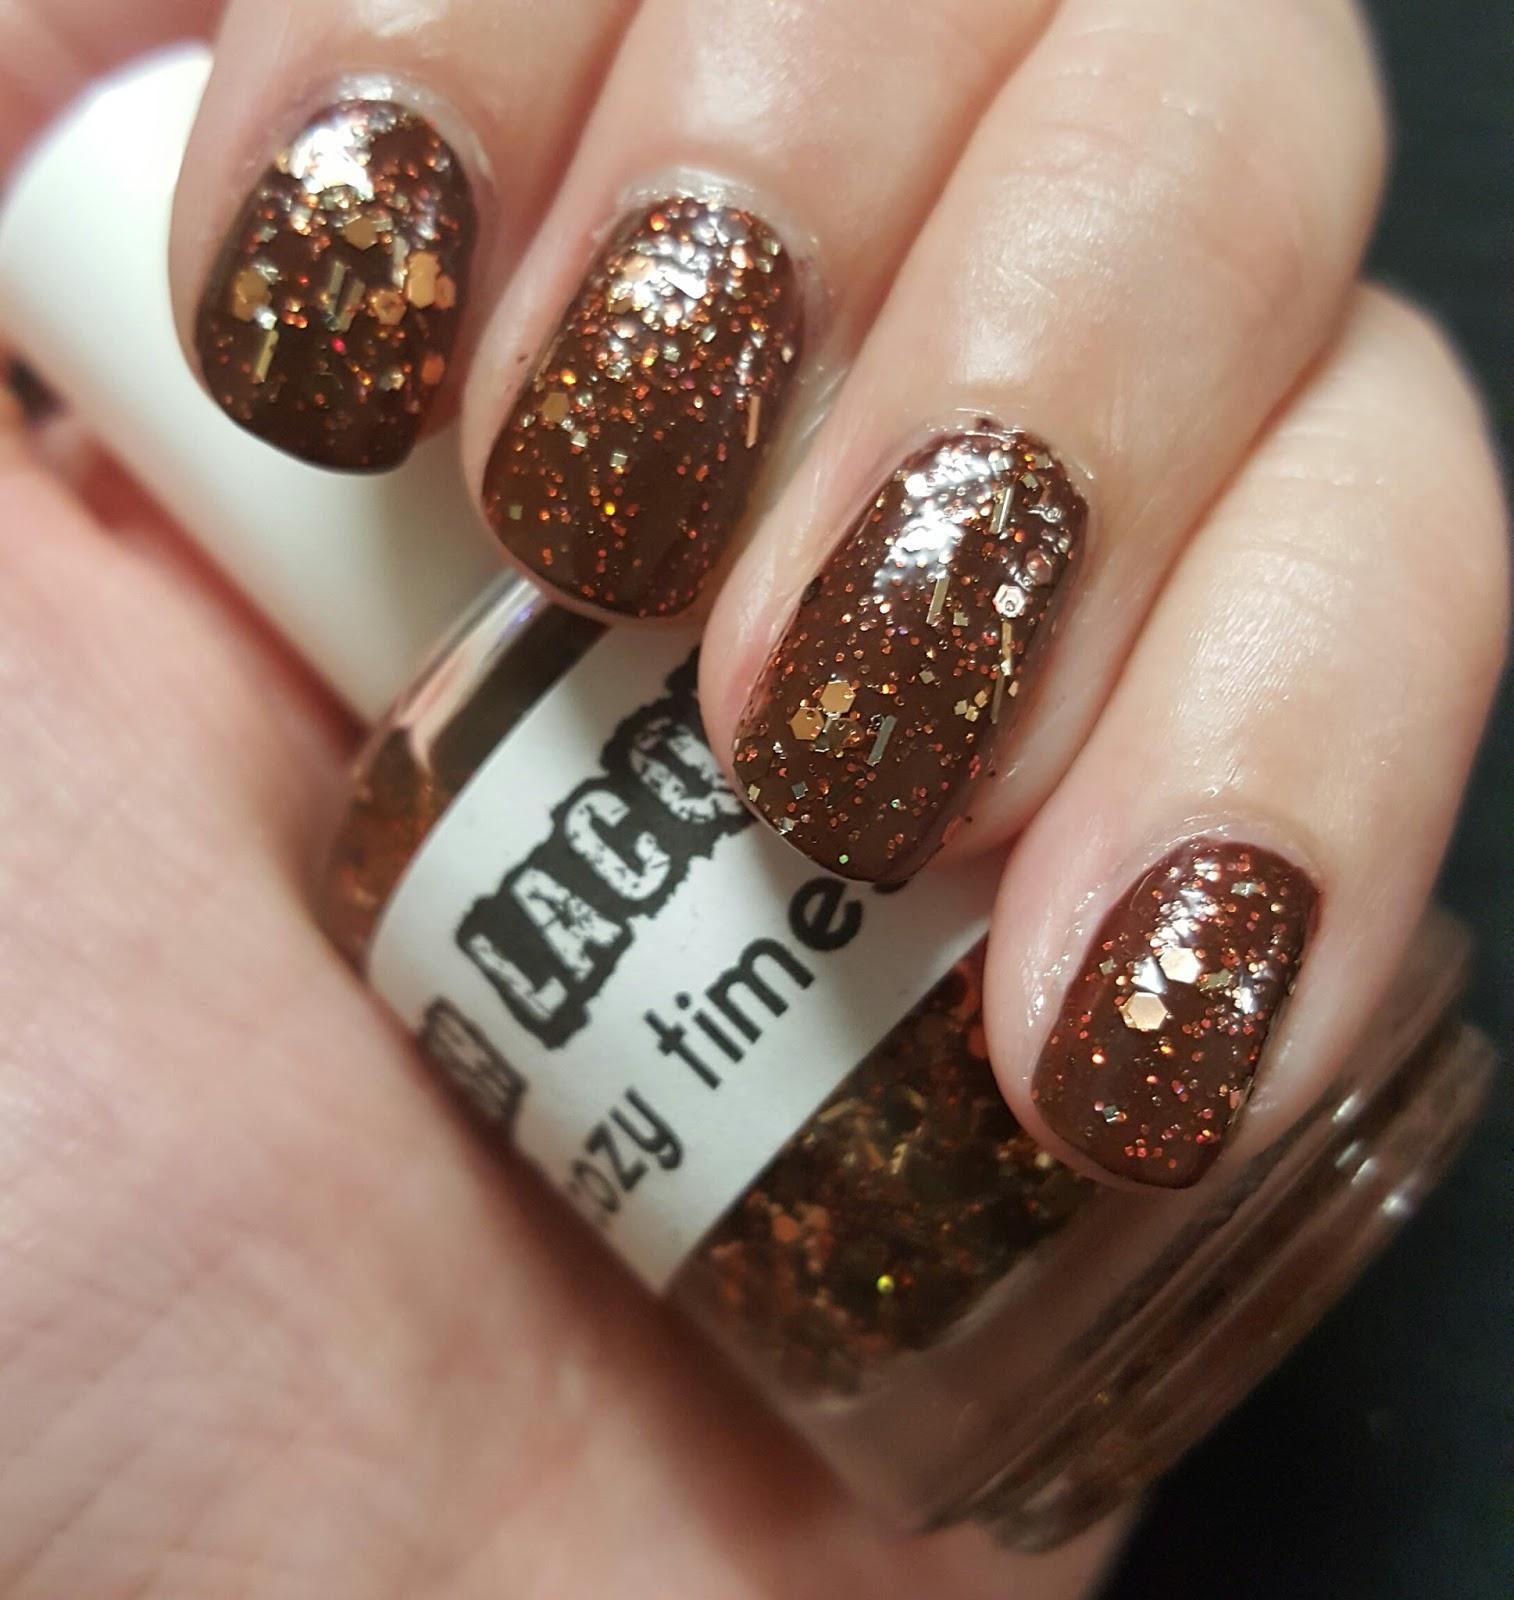 Glimmer and Glitter - A Nail Polish Blog: Fall Glitters